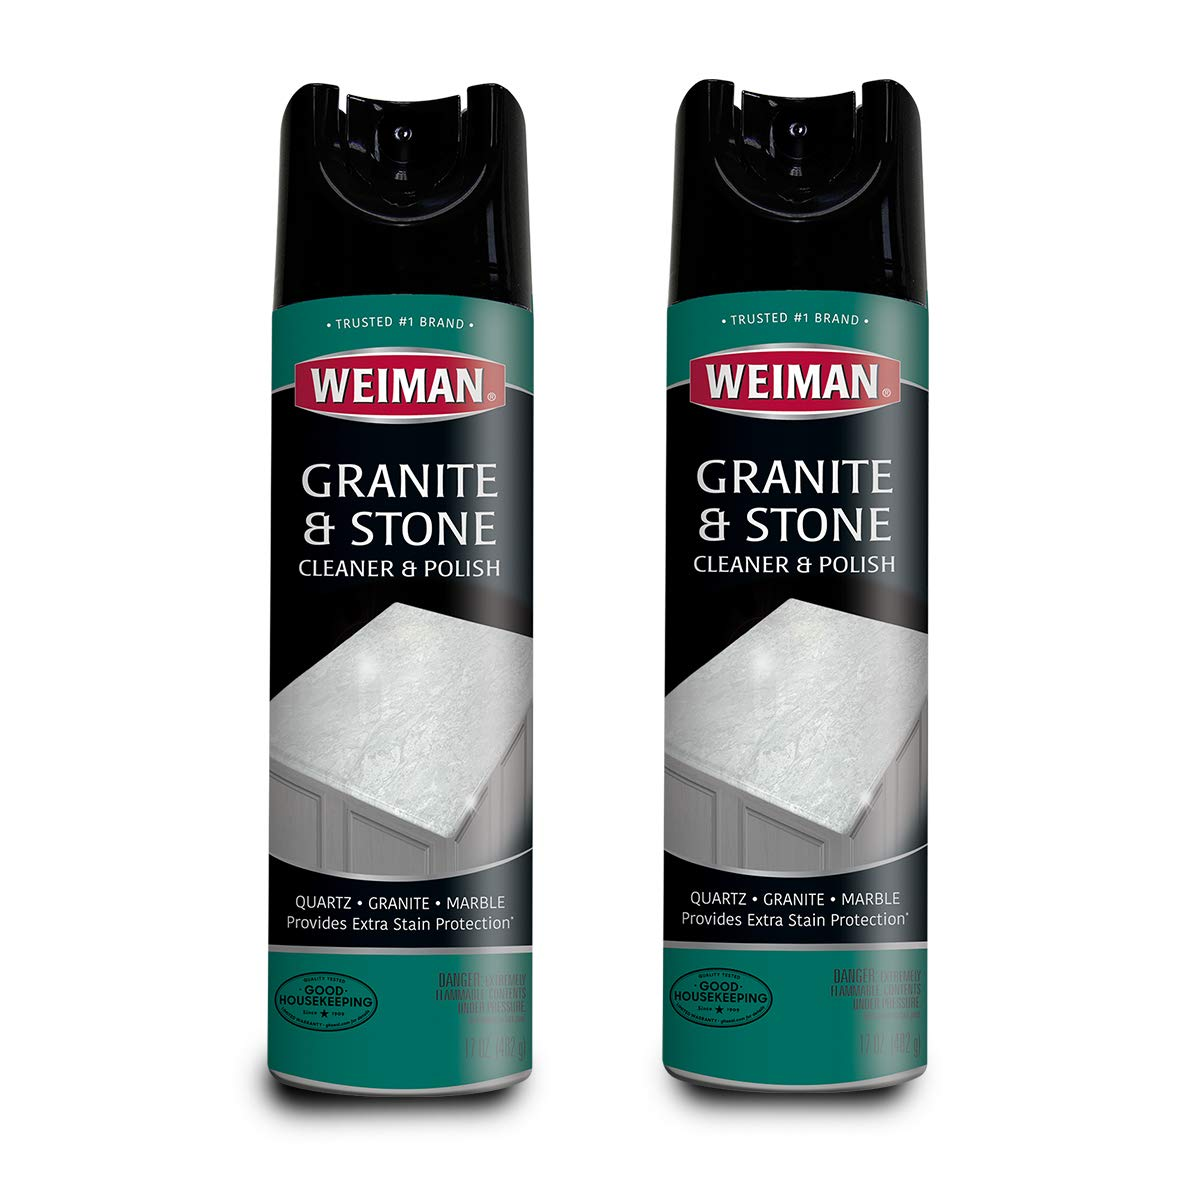 Weiman Granite Cleaner and Polish Aerosol 17 Ounce - 2 Pack - for Granite Marble Soapstone Quartz Quartzite Slate Limestone Corian Laminate Tile Countertop by Weiman